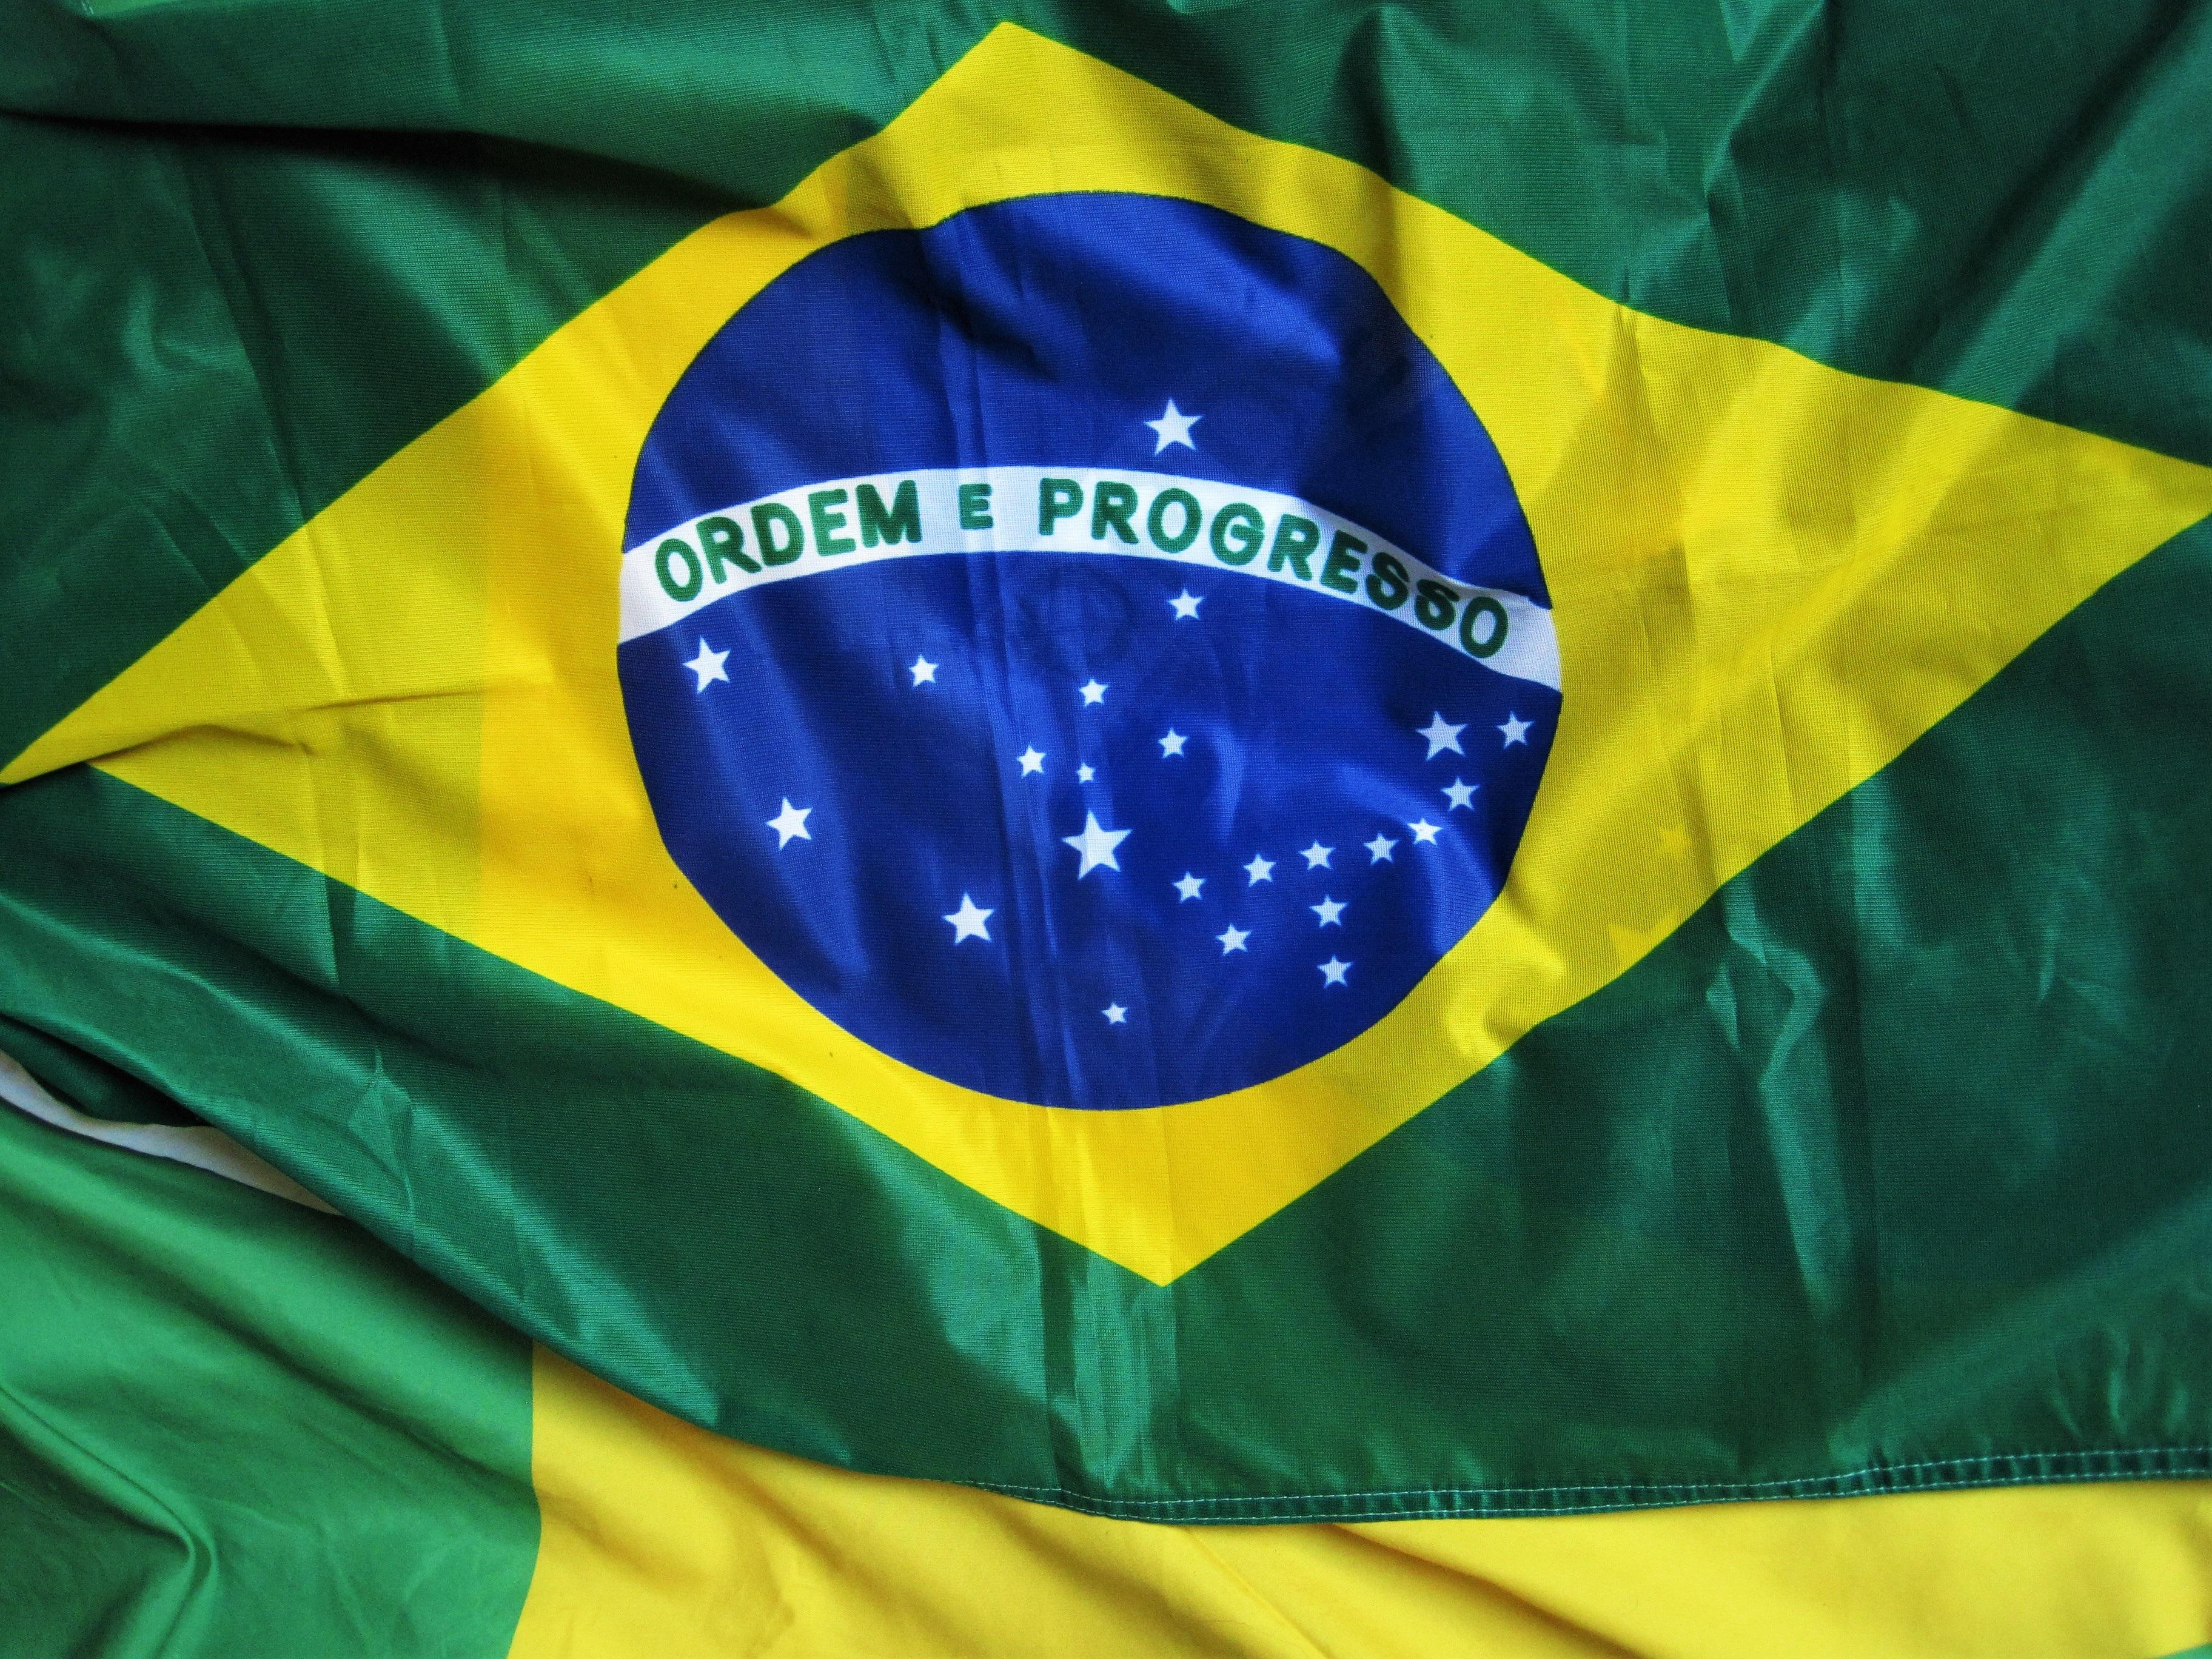 414d9668062 decoration green color flag blue yellow national flag brazil national  colours landesfarben brazilian flag ordem e